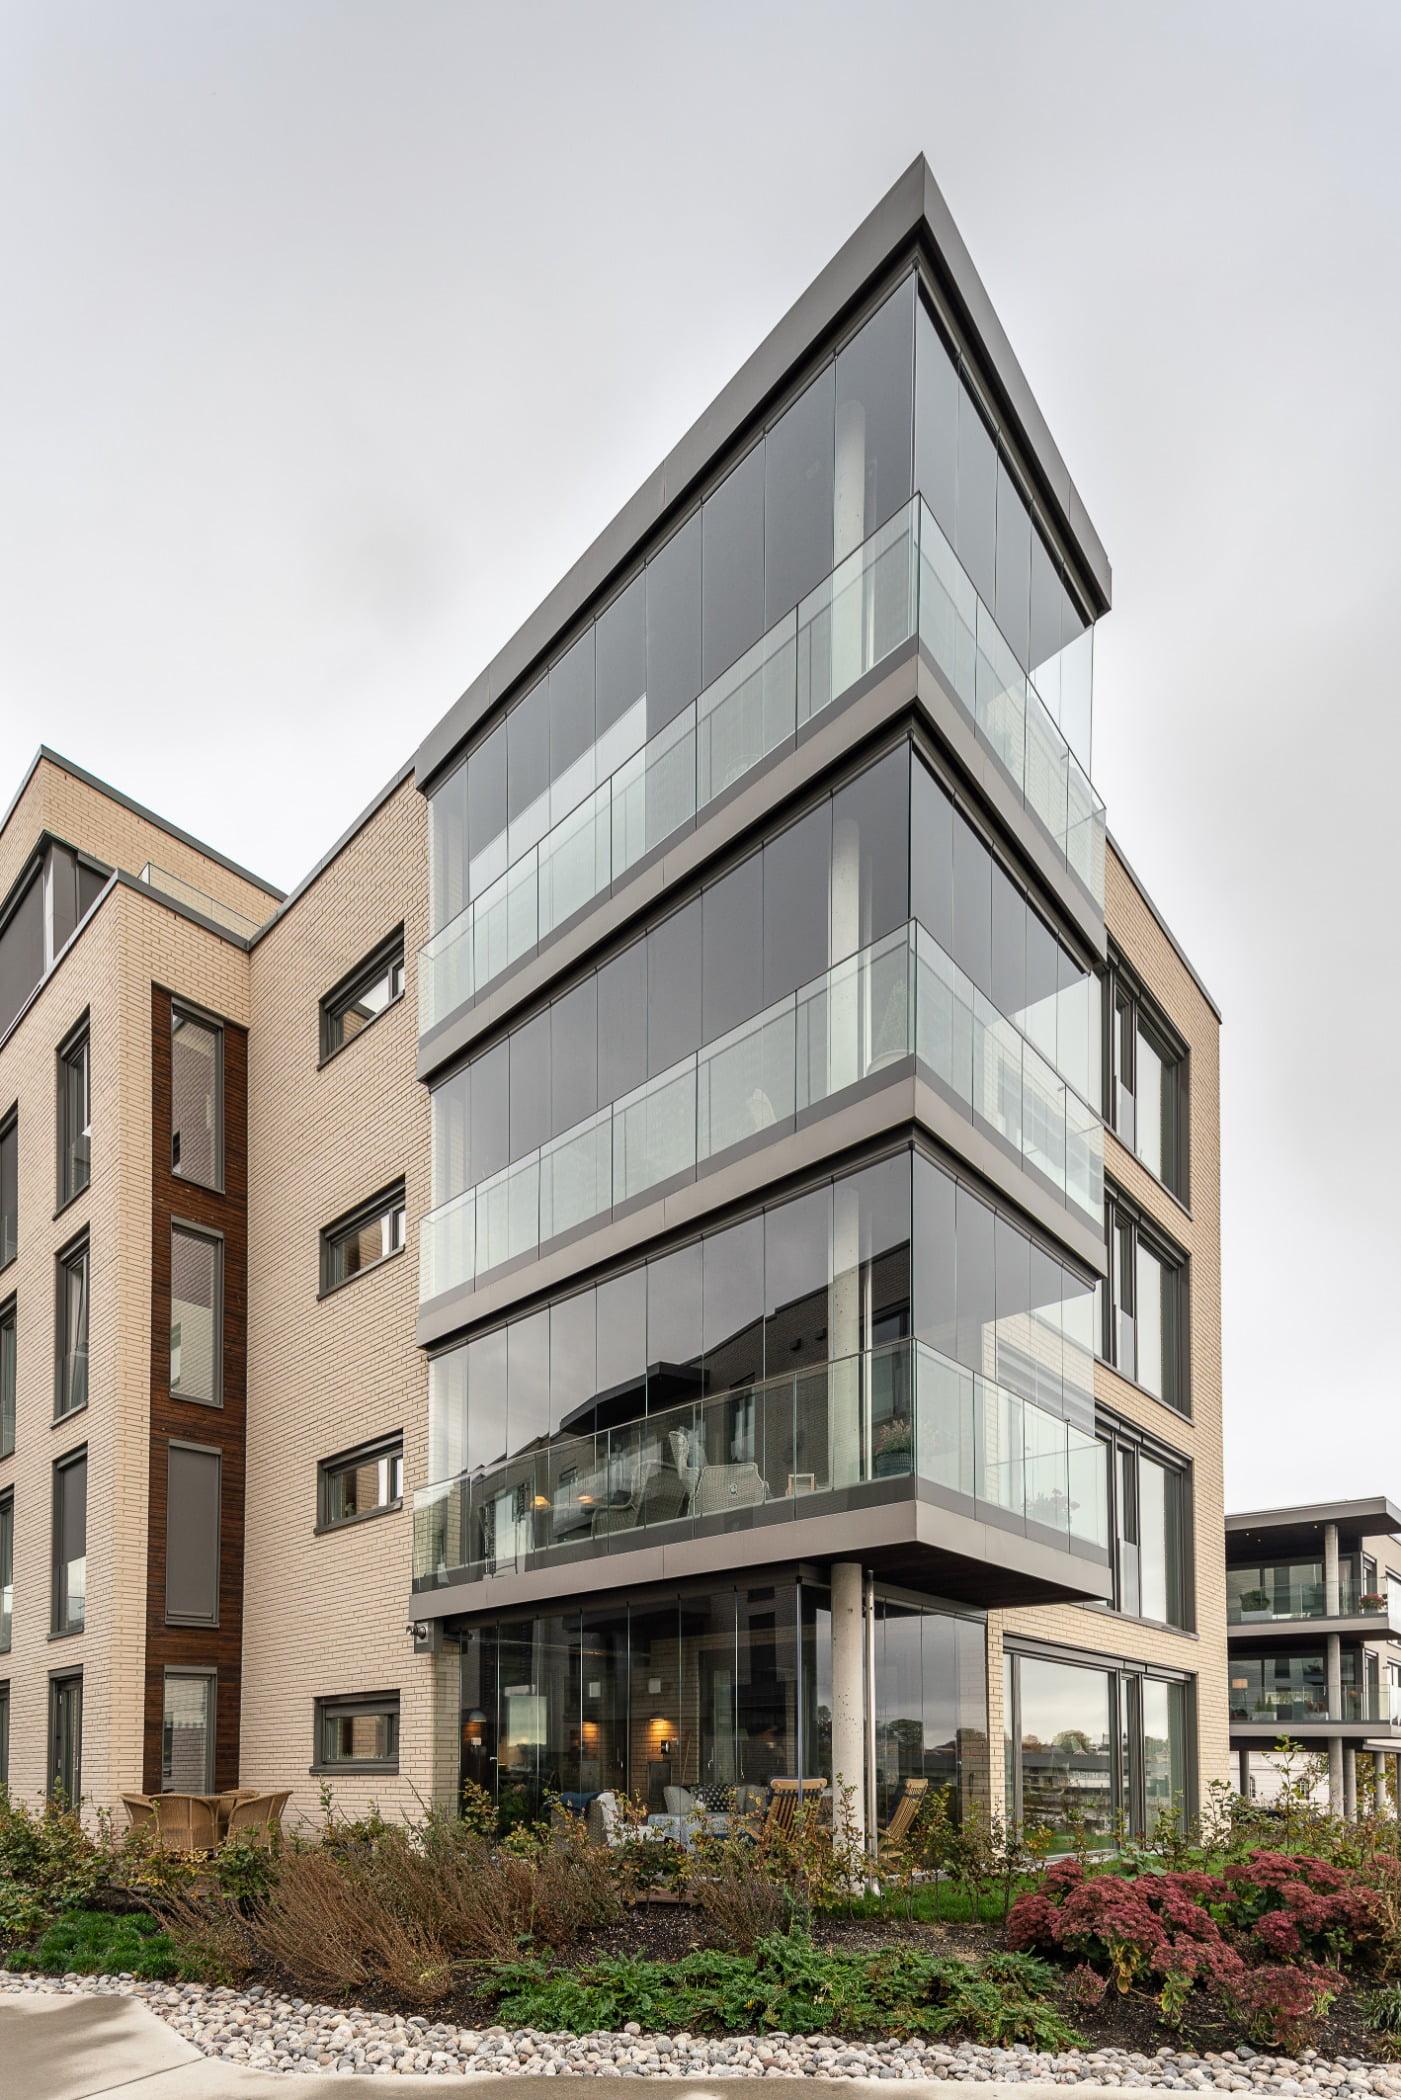 Urban design, Land lot, Tower block, Plant, Building, Window, Sky, Condominium, Fixture